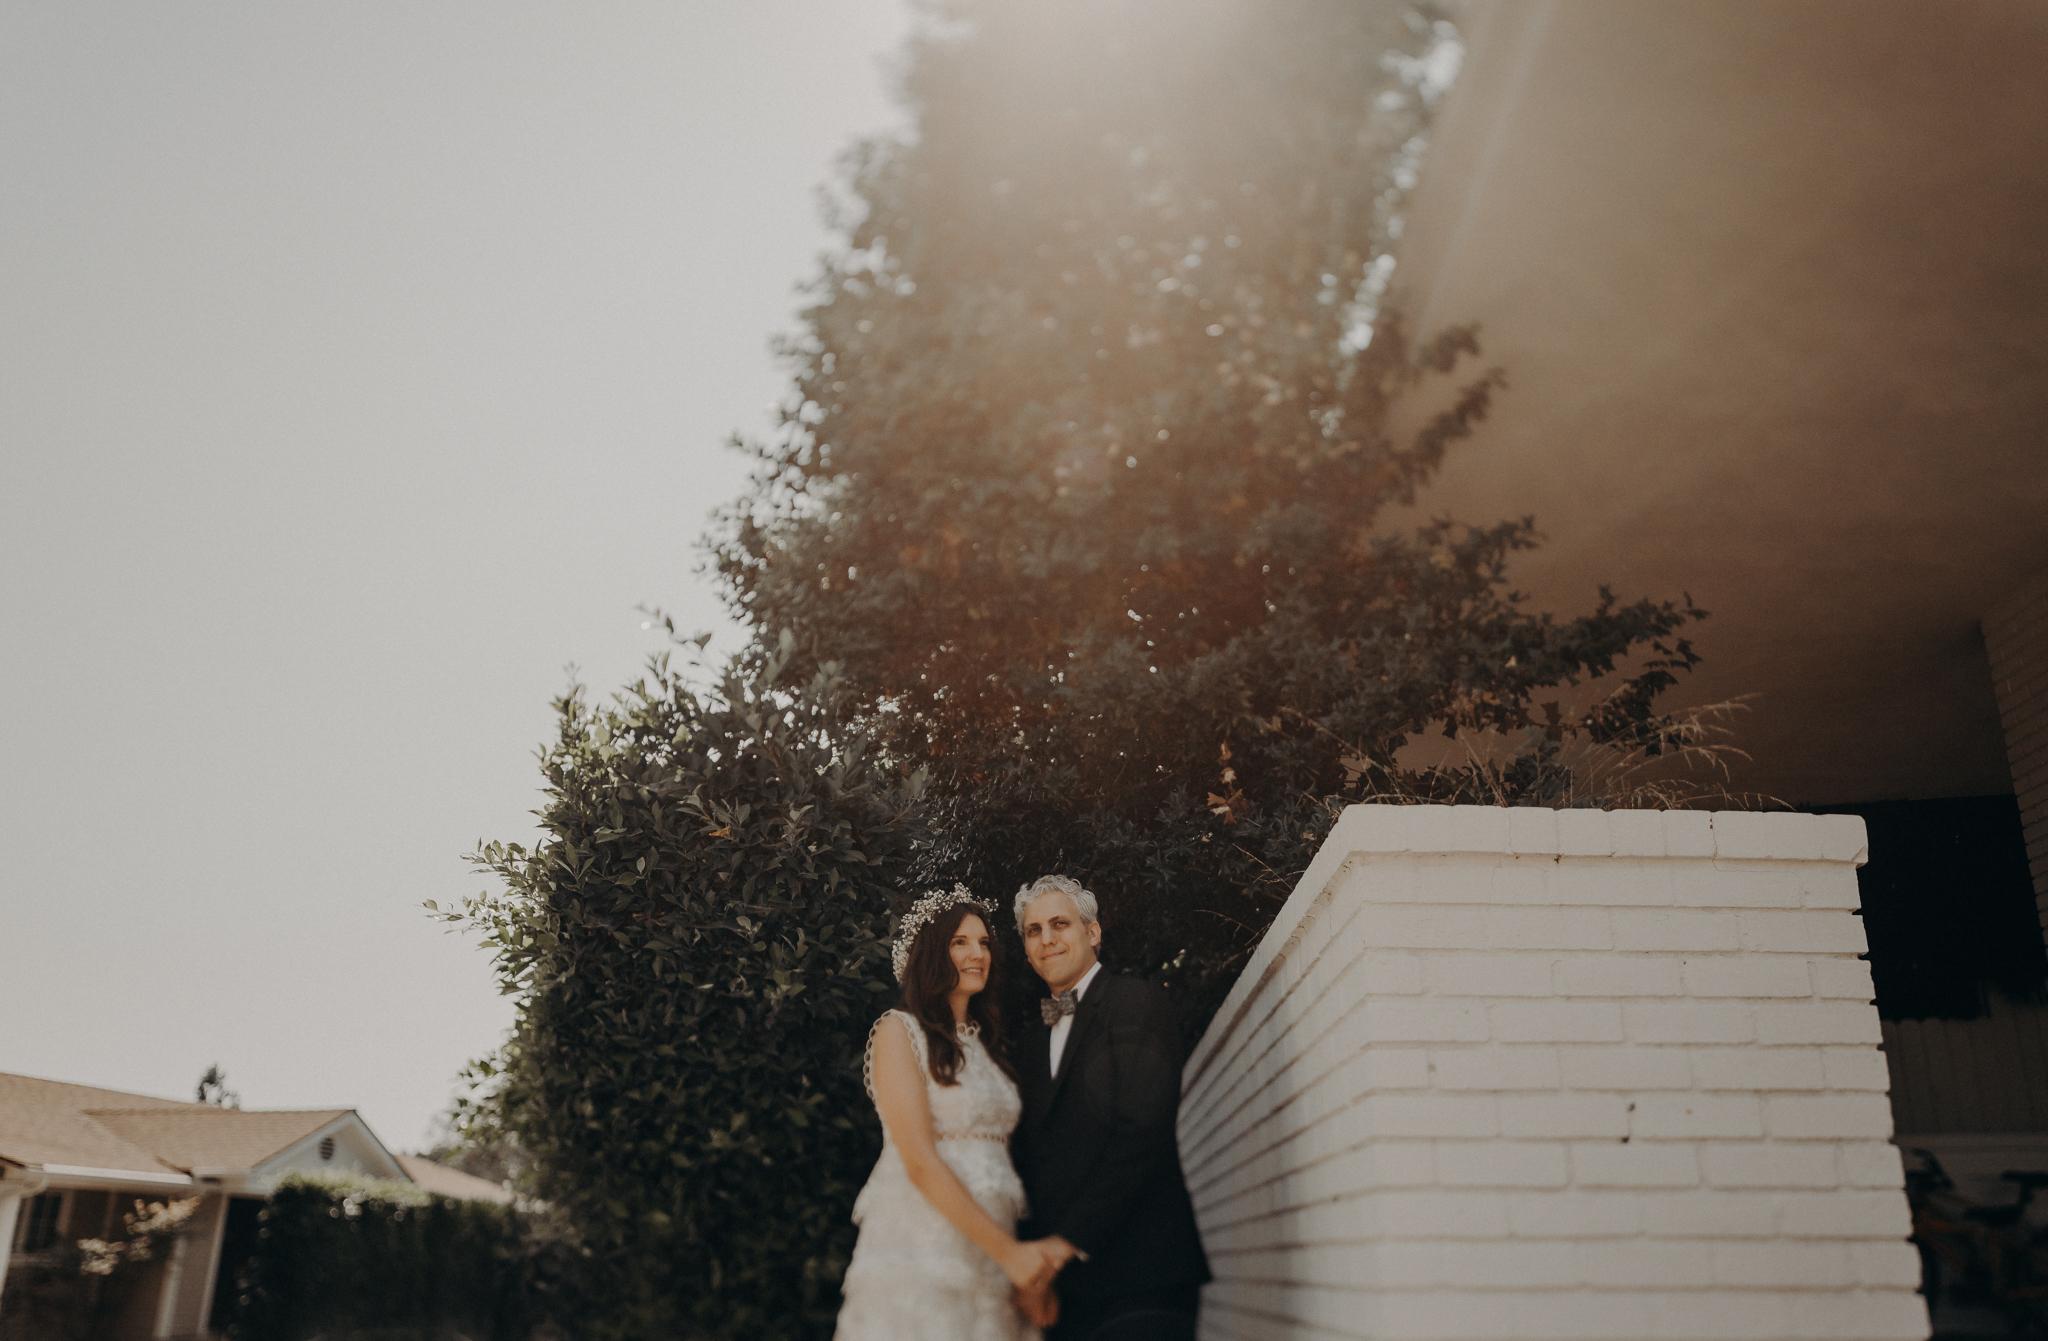 Isaiah + Taylor Photography - Private Estate Backyard Wedding - Beverly Hills - Los Angeles Wedding Photographer - 39.jpg